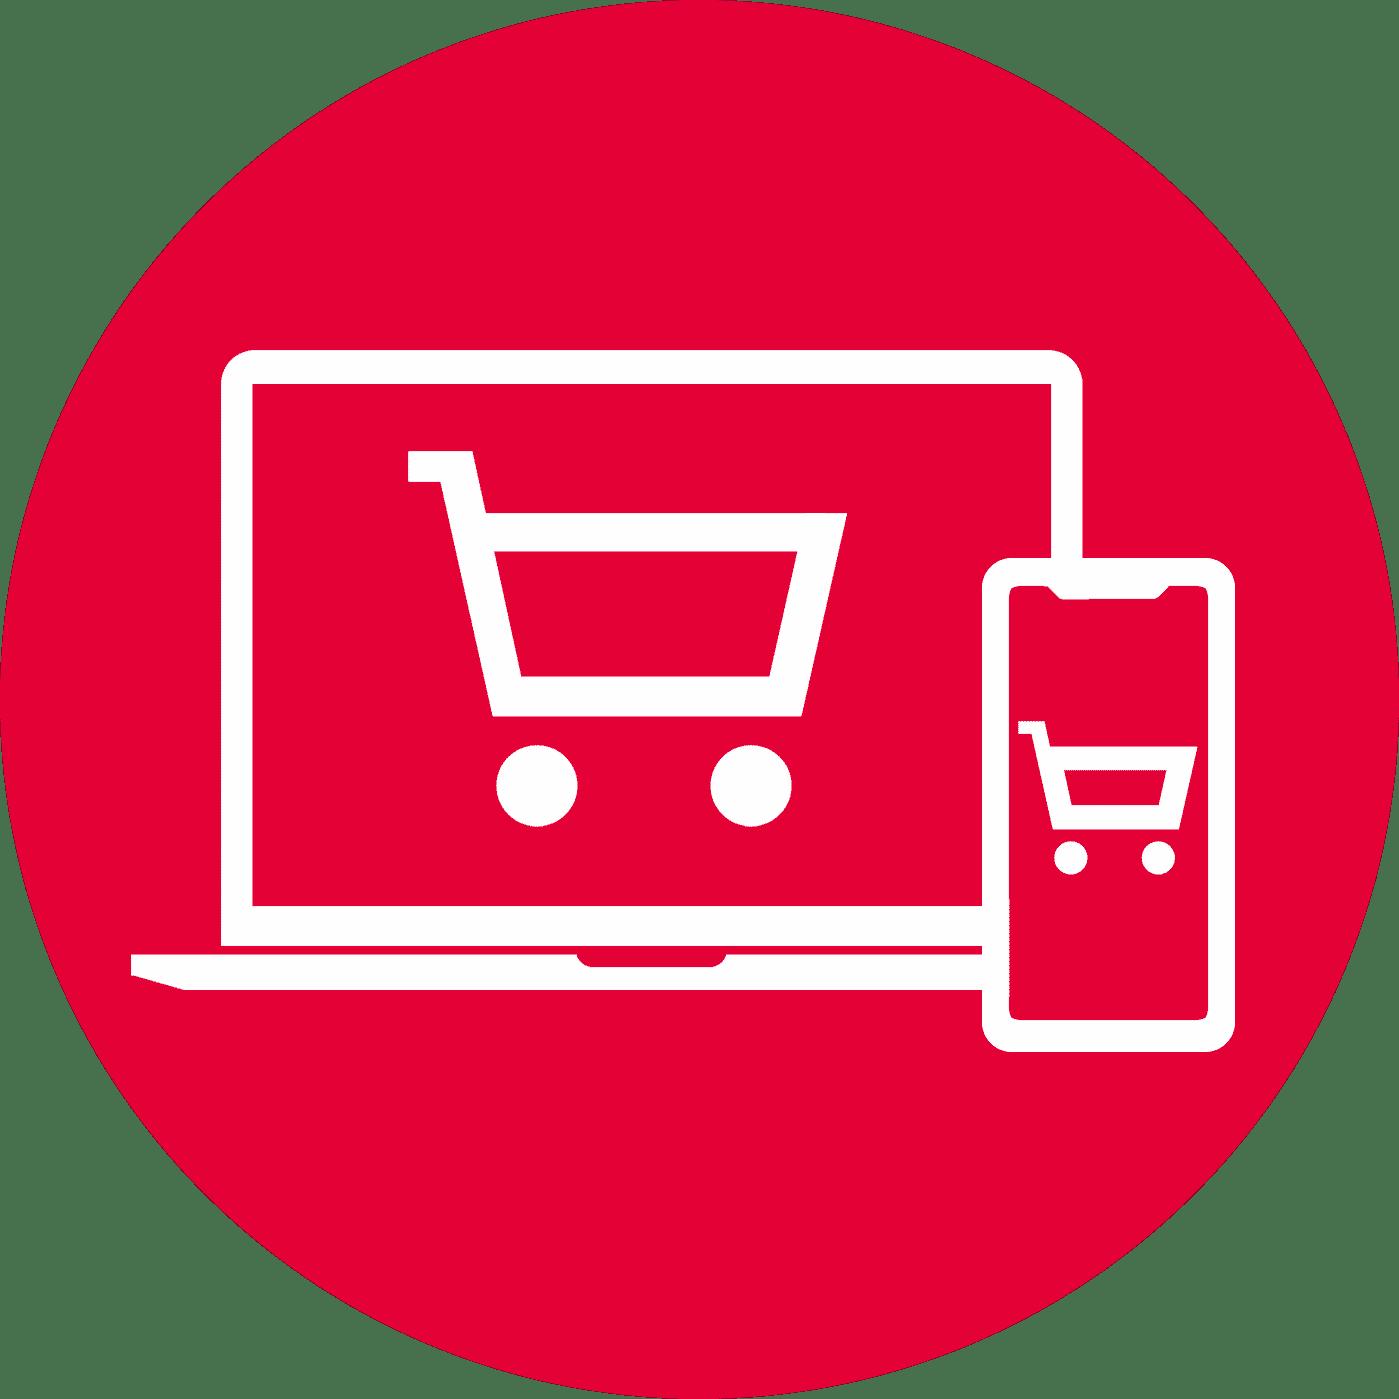 Webdesign Online-Shop Homepage Corporate Design Grafik Design Logo Brand Kreation Firmendrucksachen Briefschaften Schriftzug Fotografie Digitale Bildbearbeitung Photo-Composing Video-Erstellung Motion-Design Movie-Editing ShowMyProject Digital Agentur Basel 2021